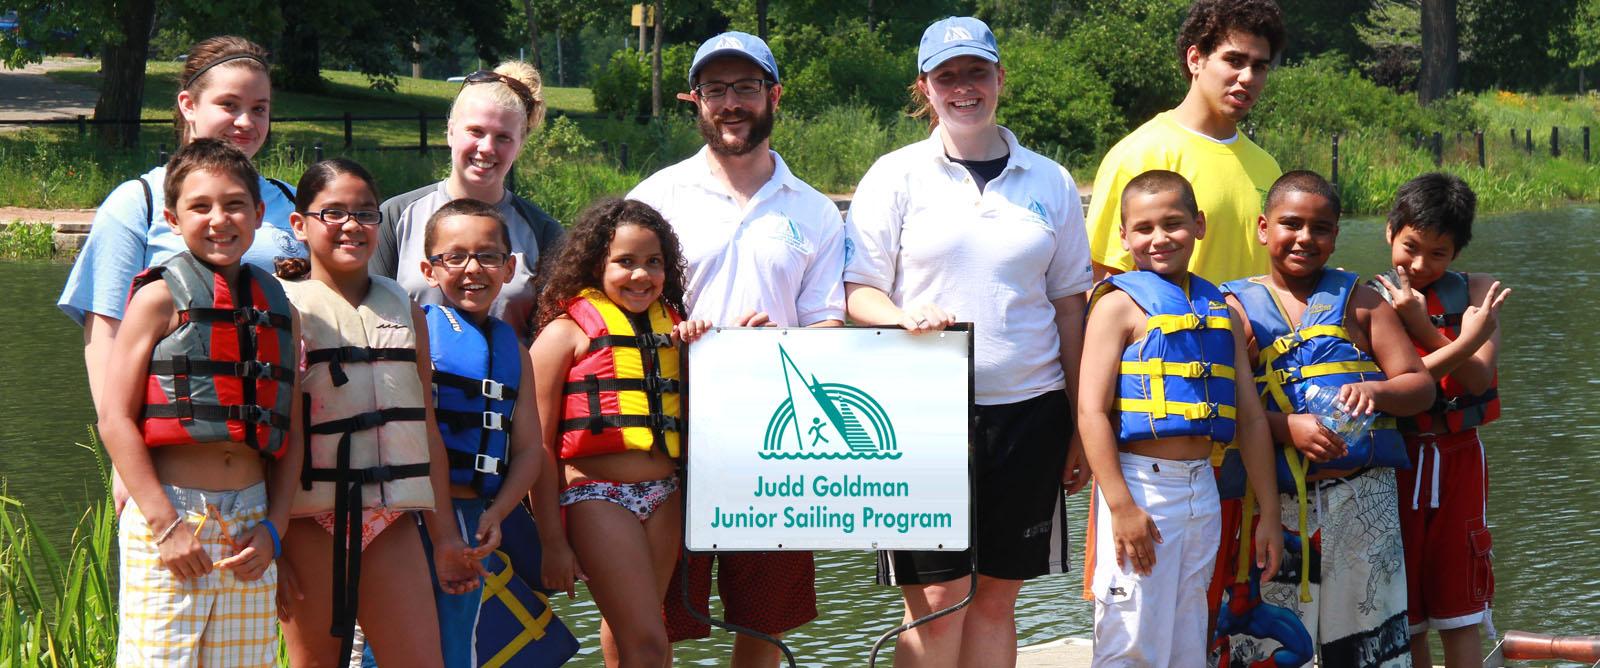 The Judd Goldman Junior Sailing Program